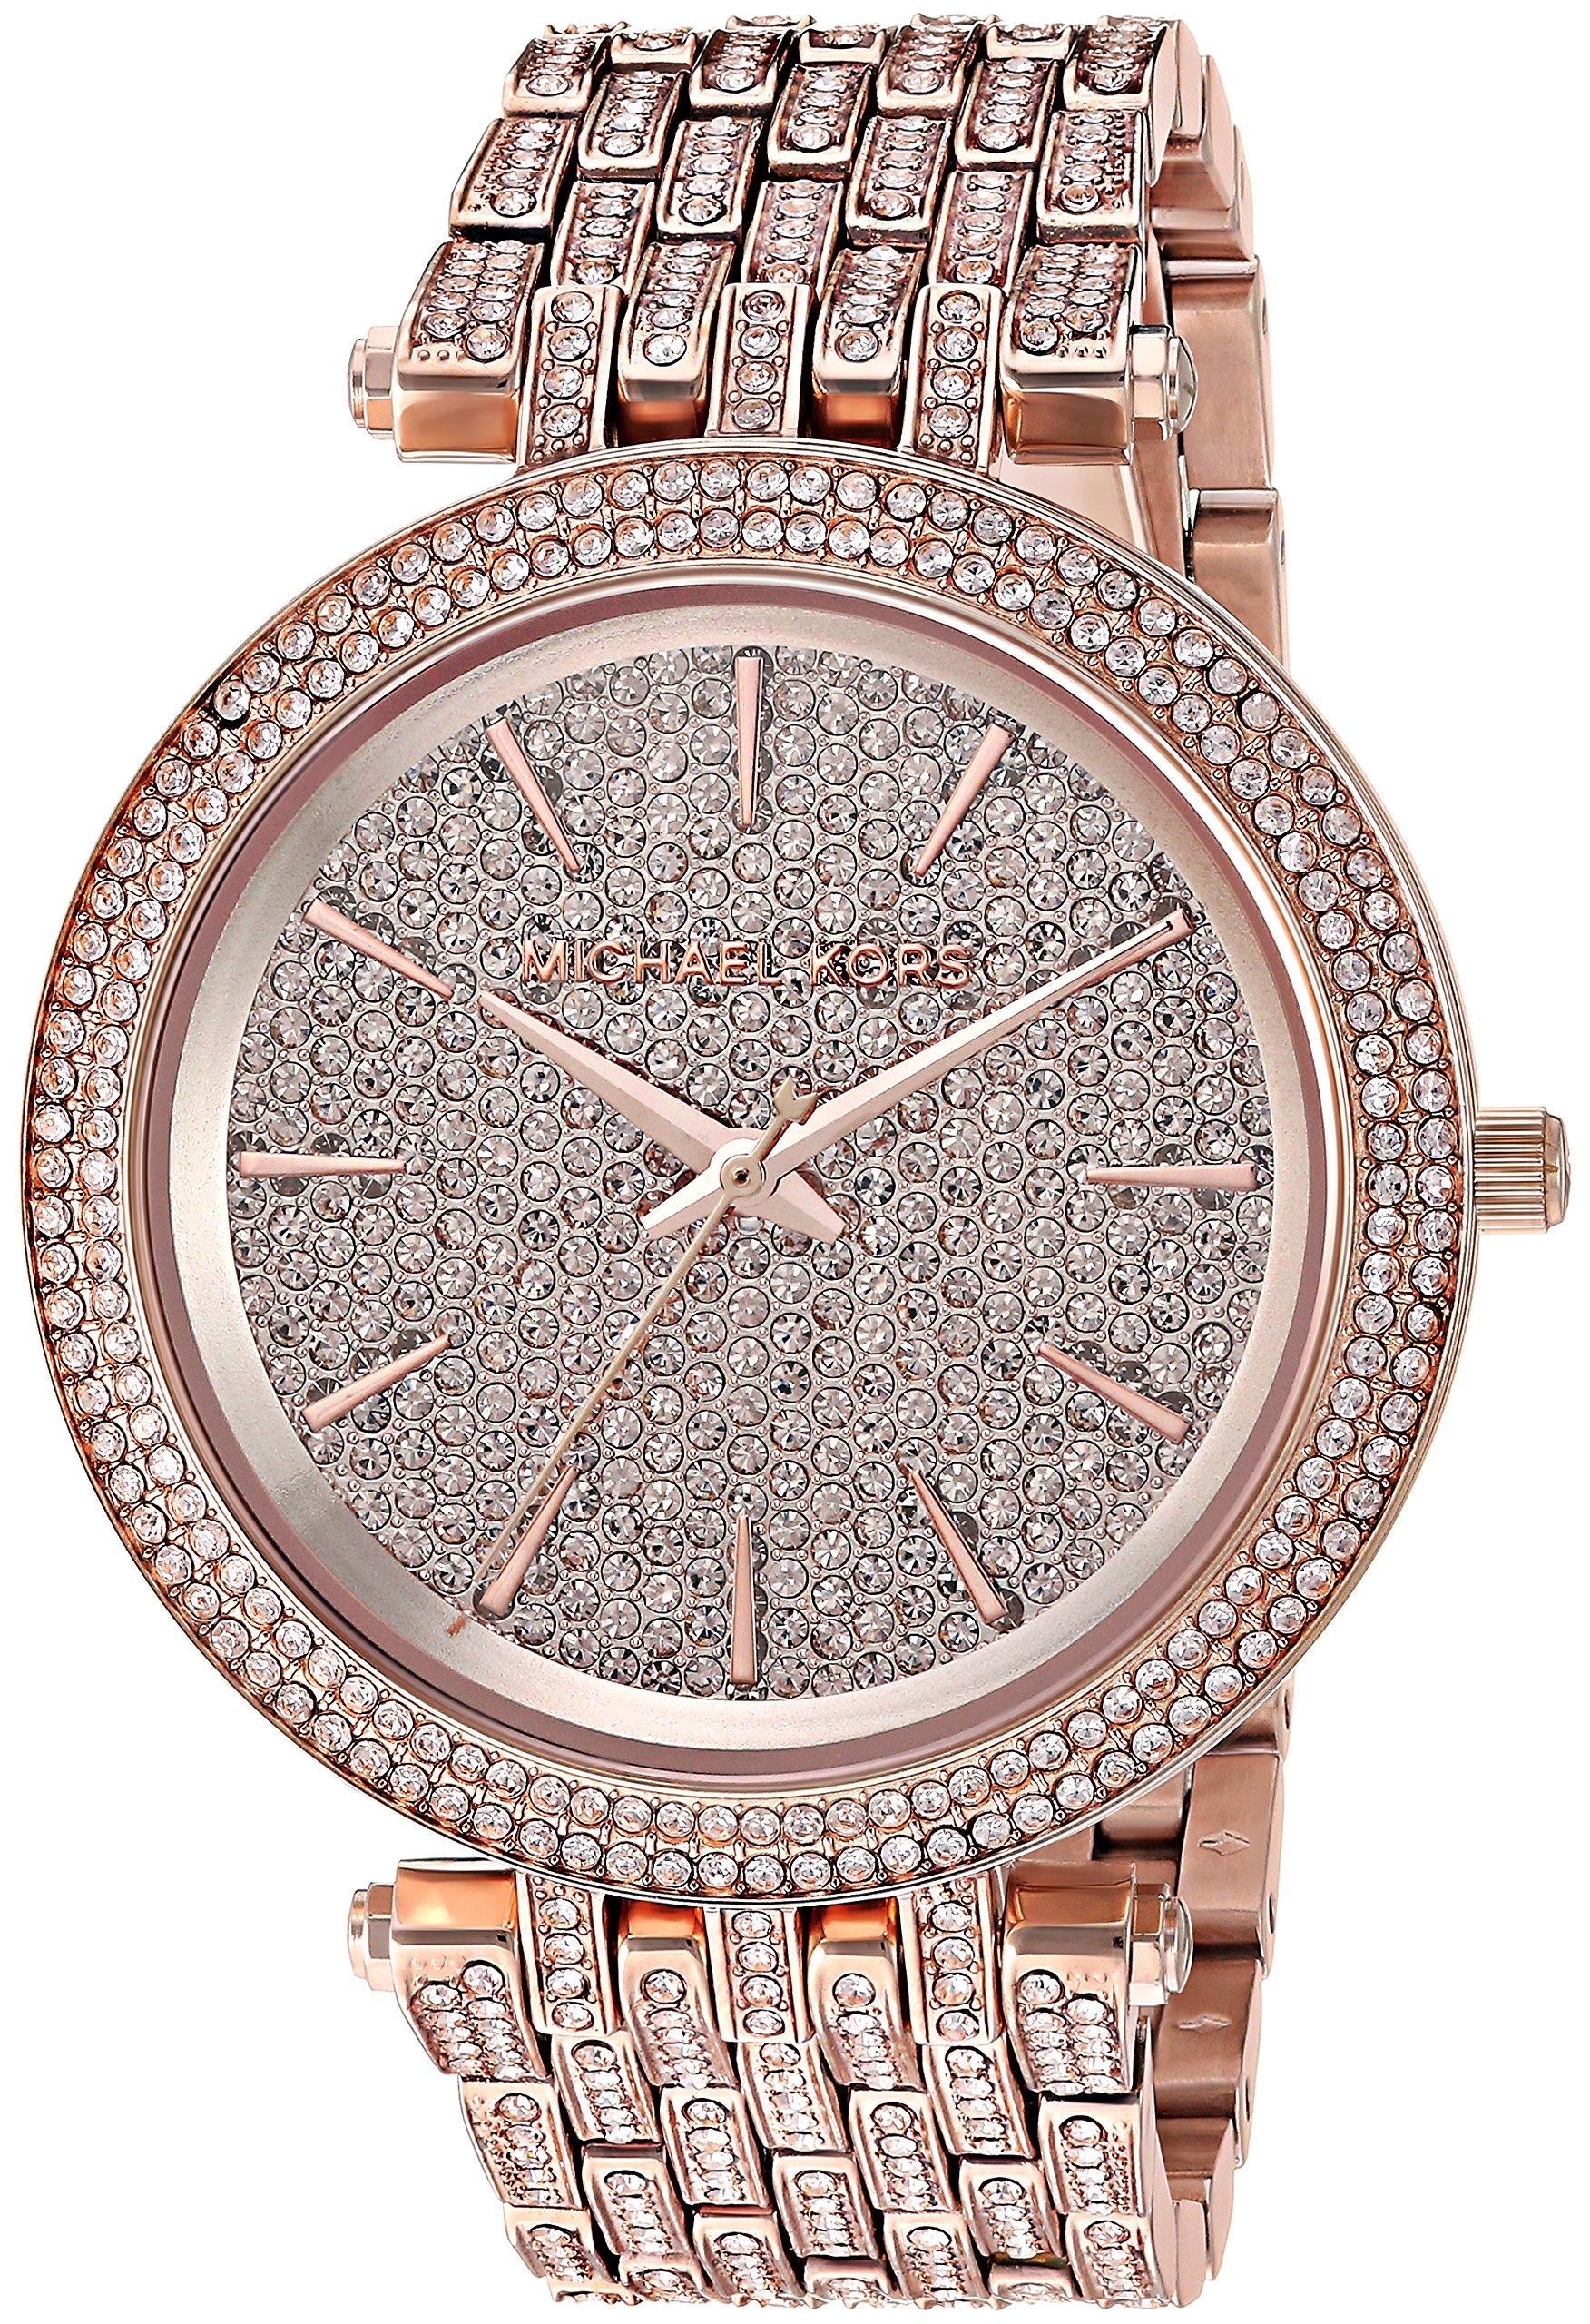 Michael Kors Women's 'Darci' Quartz Stainless Steel Casual Watch, Color:Rose Gold-Toned (Model: MK3780)